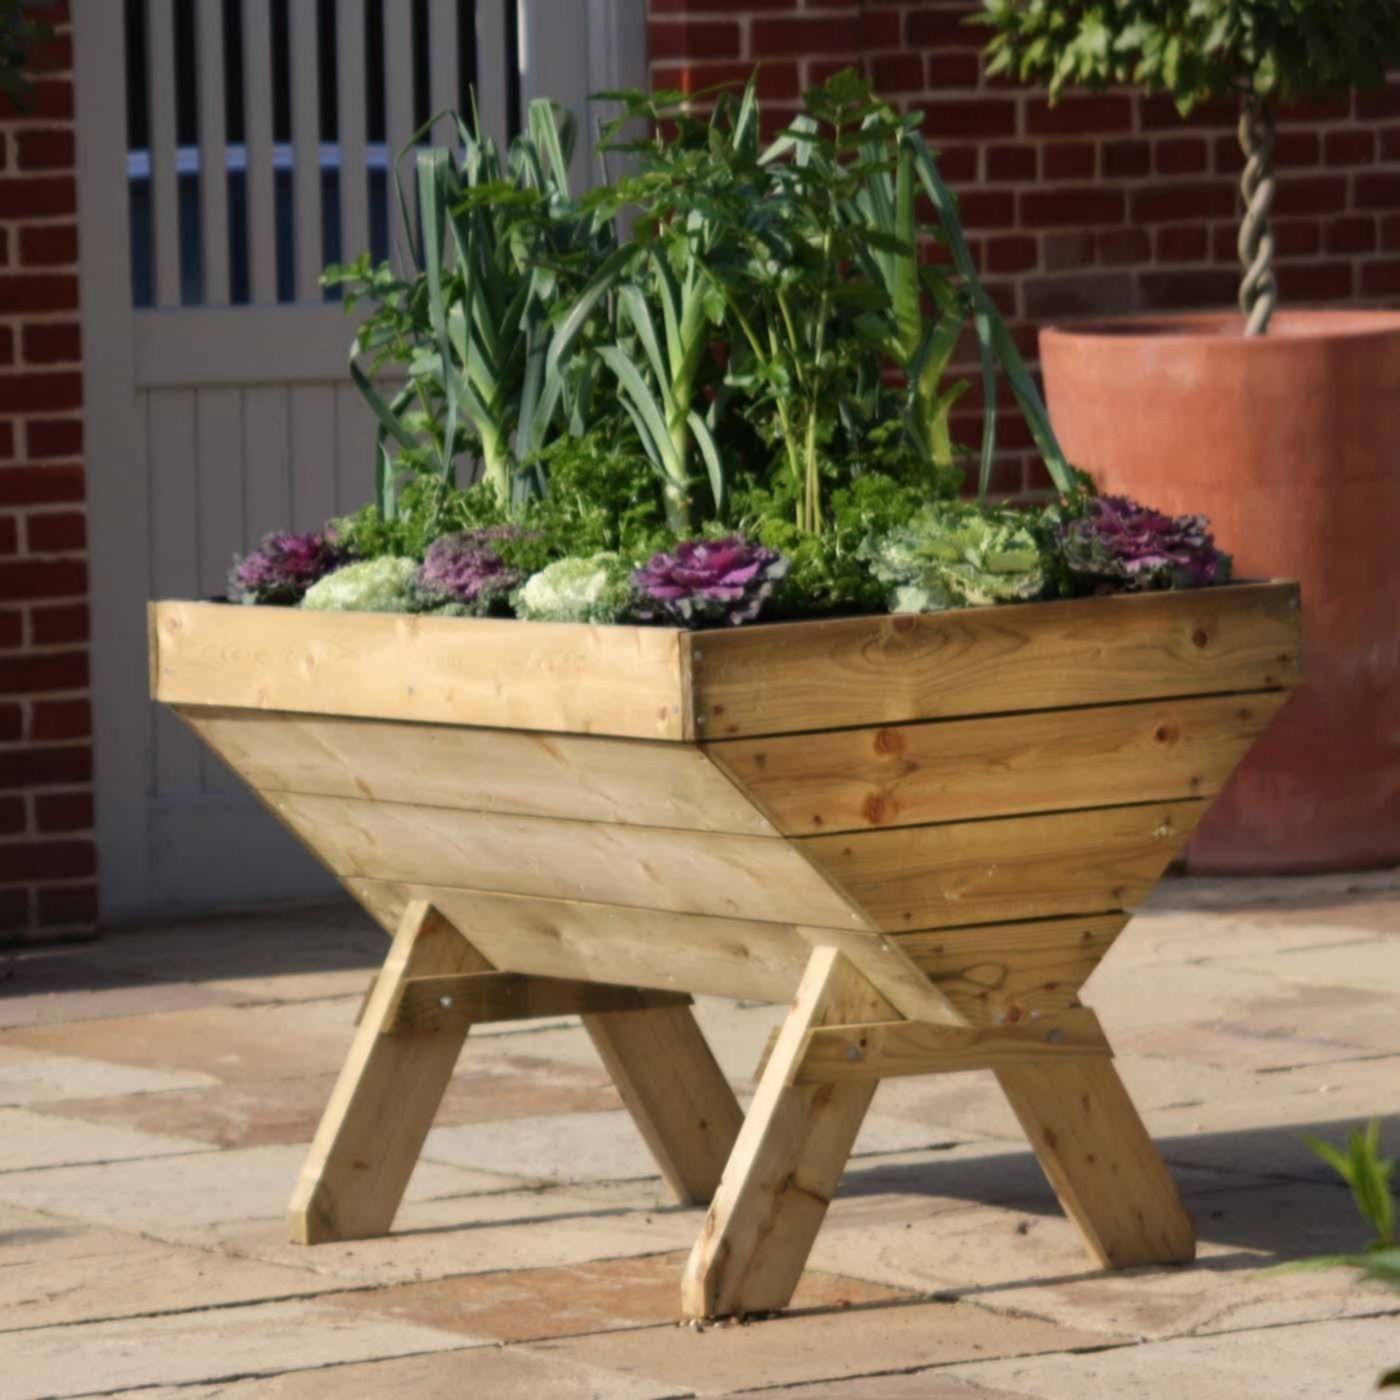 Raised Wooden Vegetable Troughs